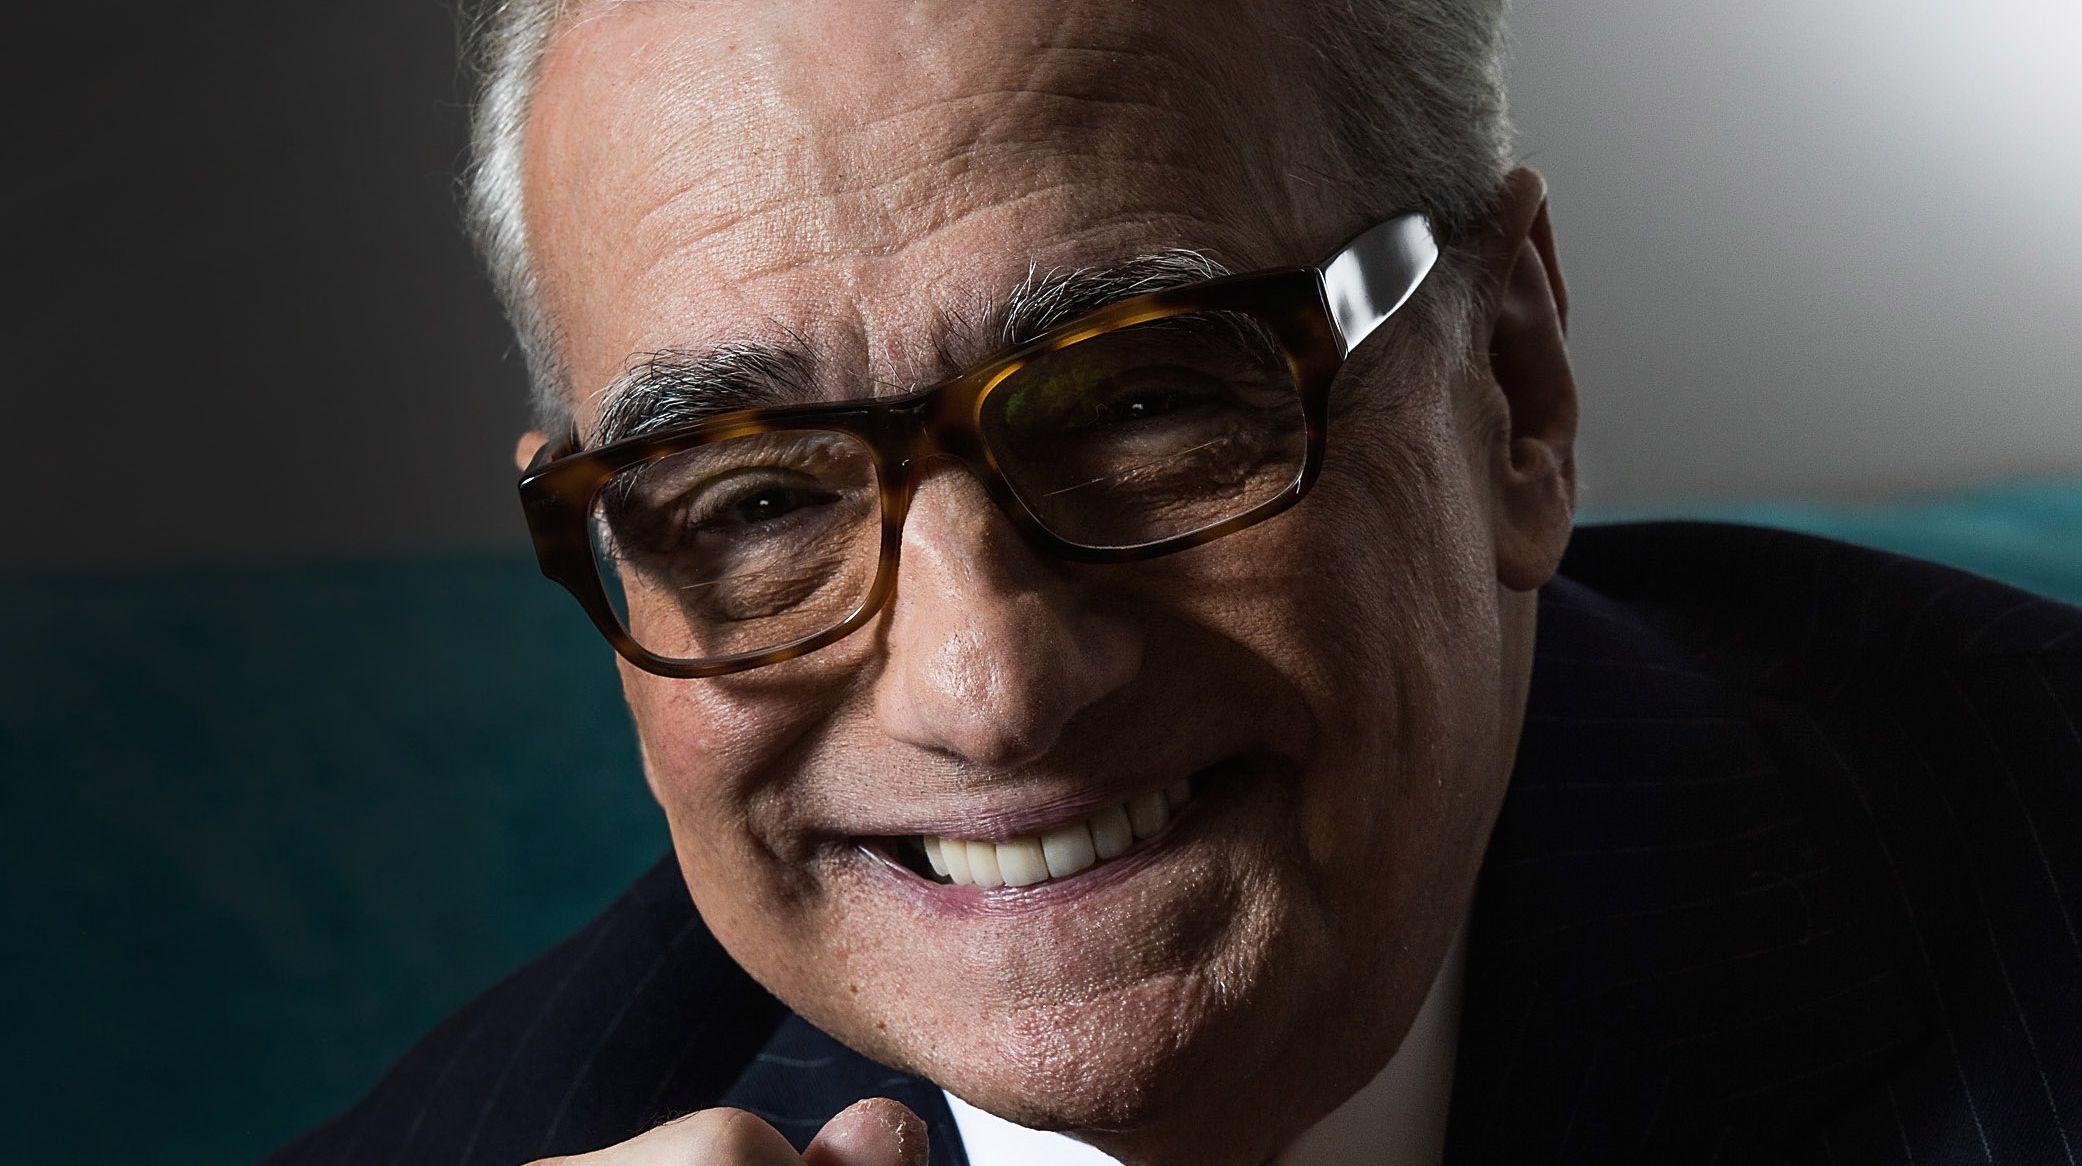 Martin Scorsese Says Marvel Movies Are 'Not Cinema'